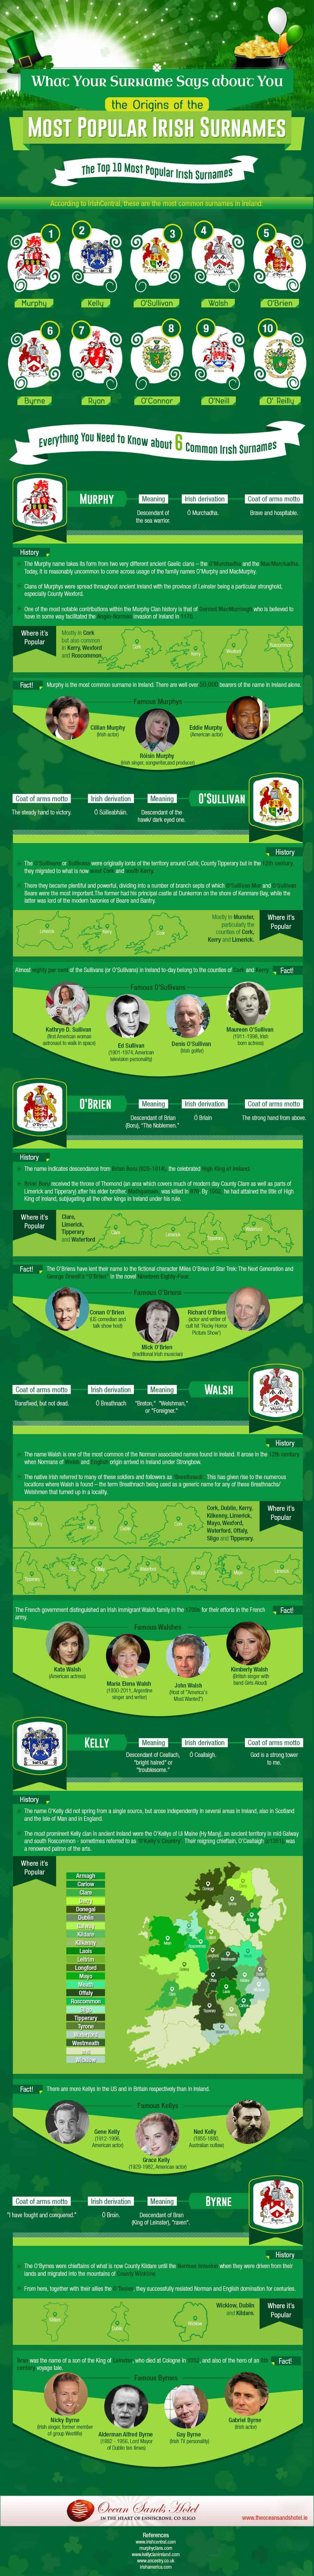 St.Patricks-Day-Infographic